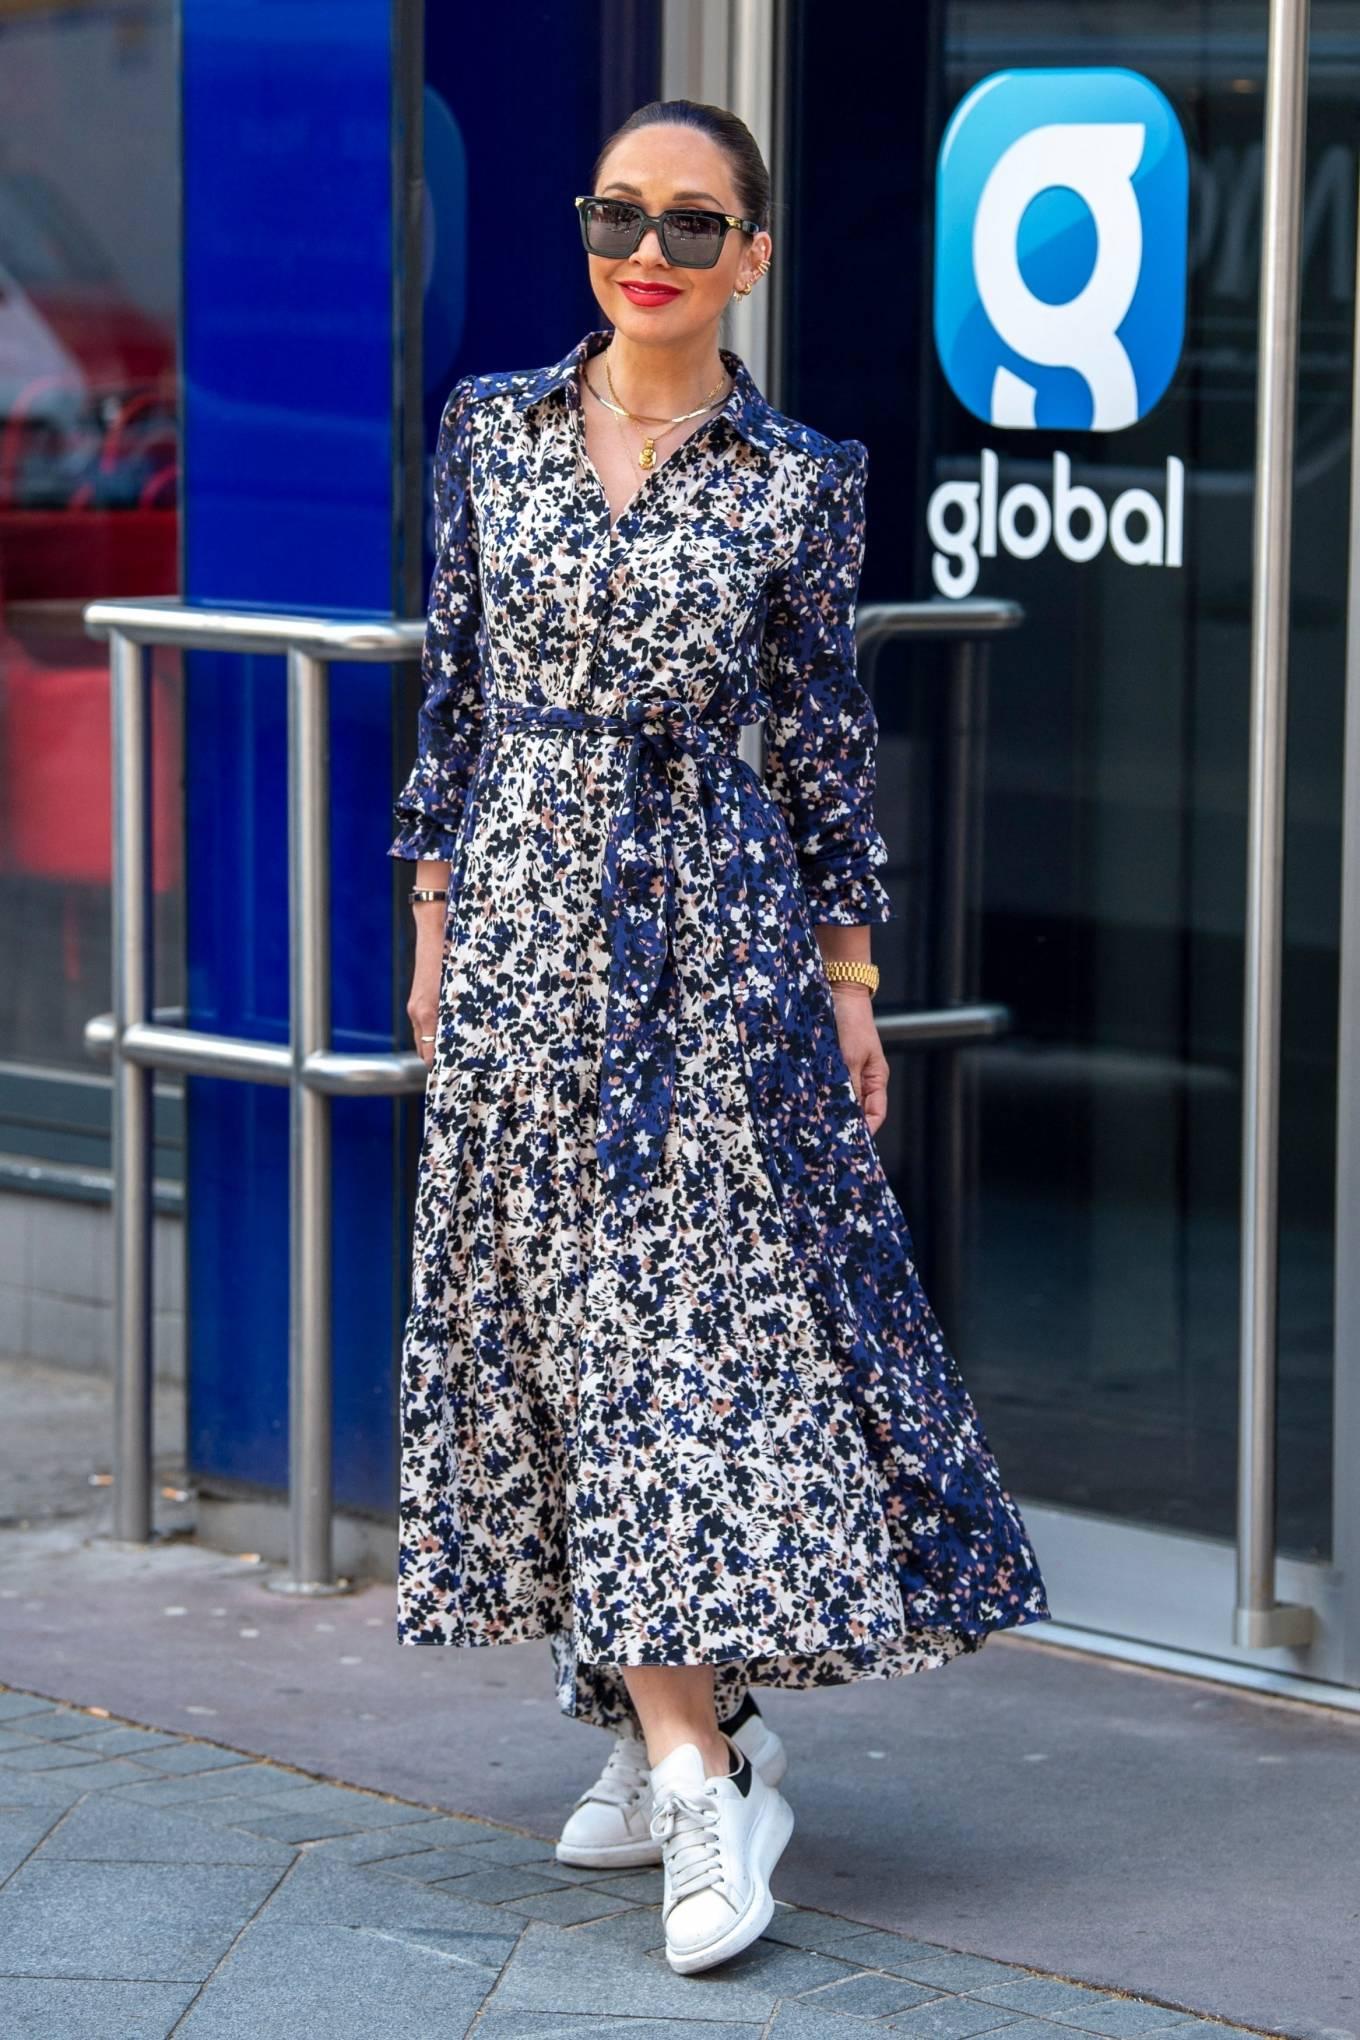 Myleene Klass 2021 : Myleene Klass – In a long summer dress arriving at the Global studios -03